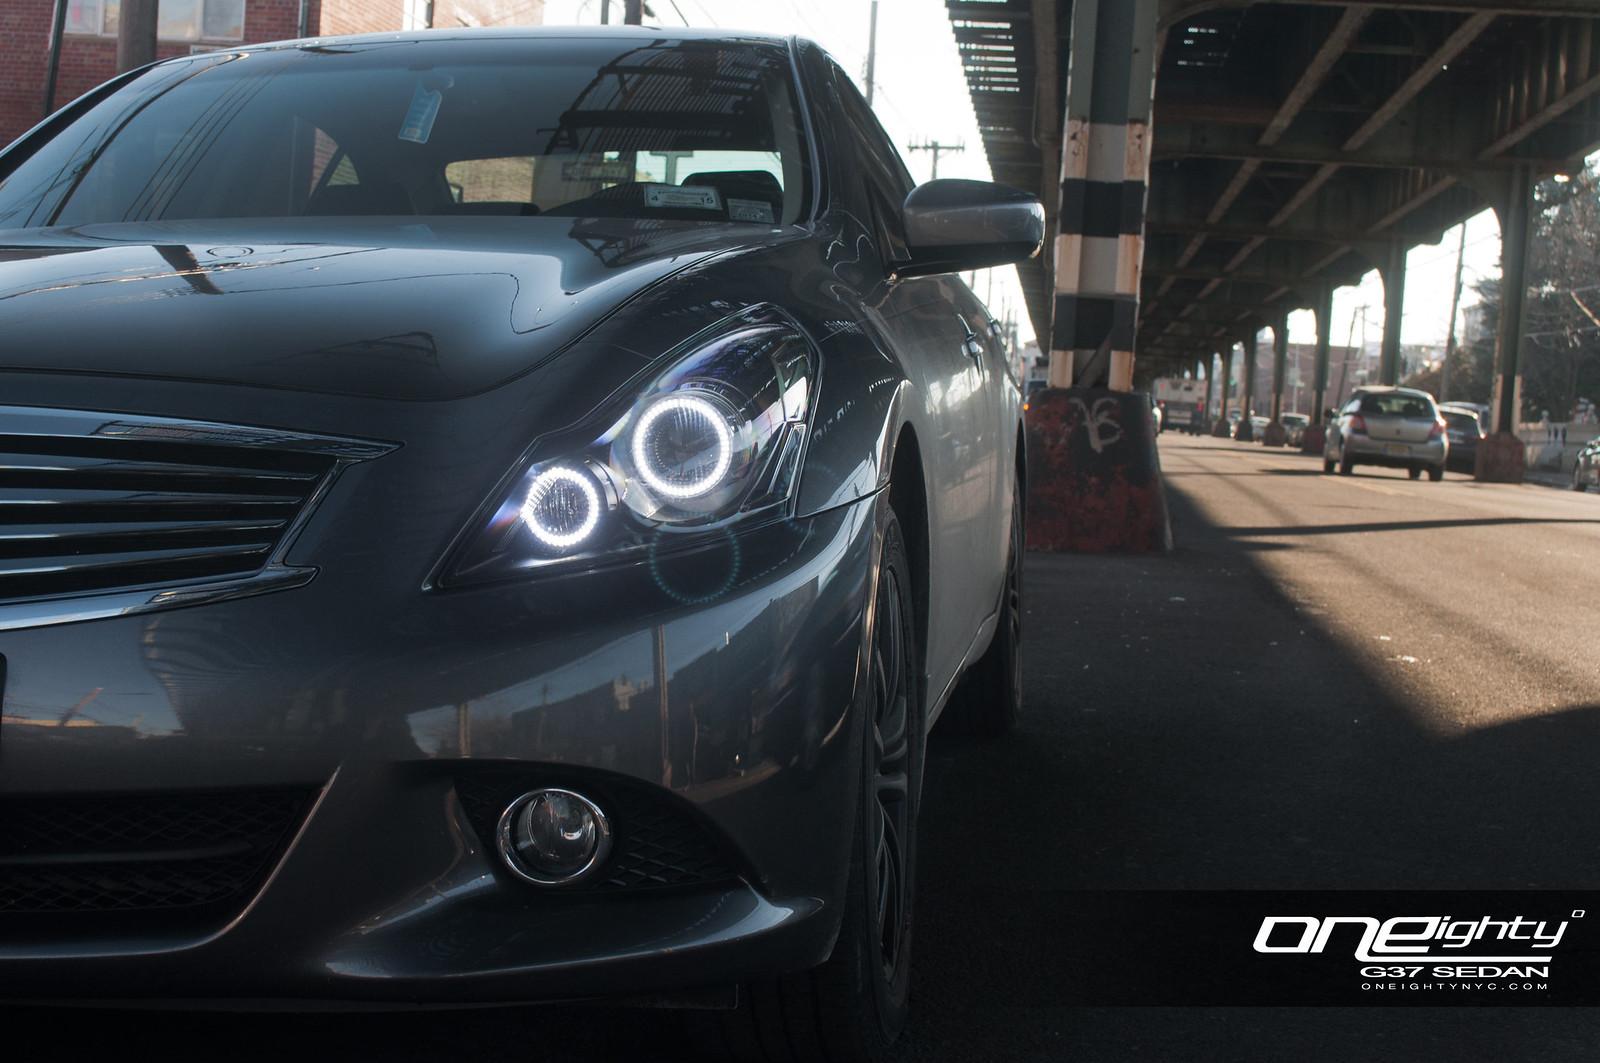 Vendor Oneighty G37 Sedan Custom Headlight Modification